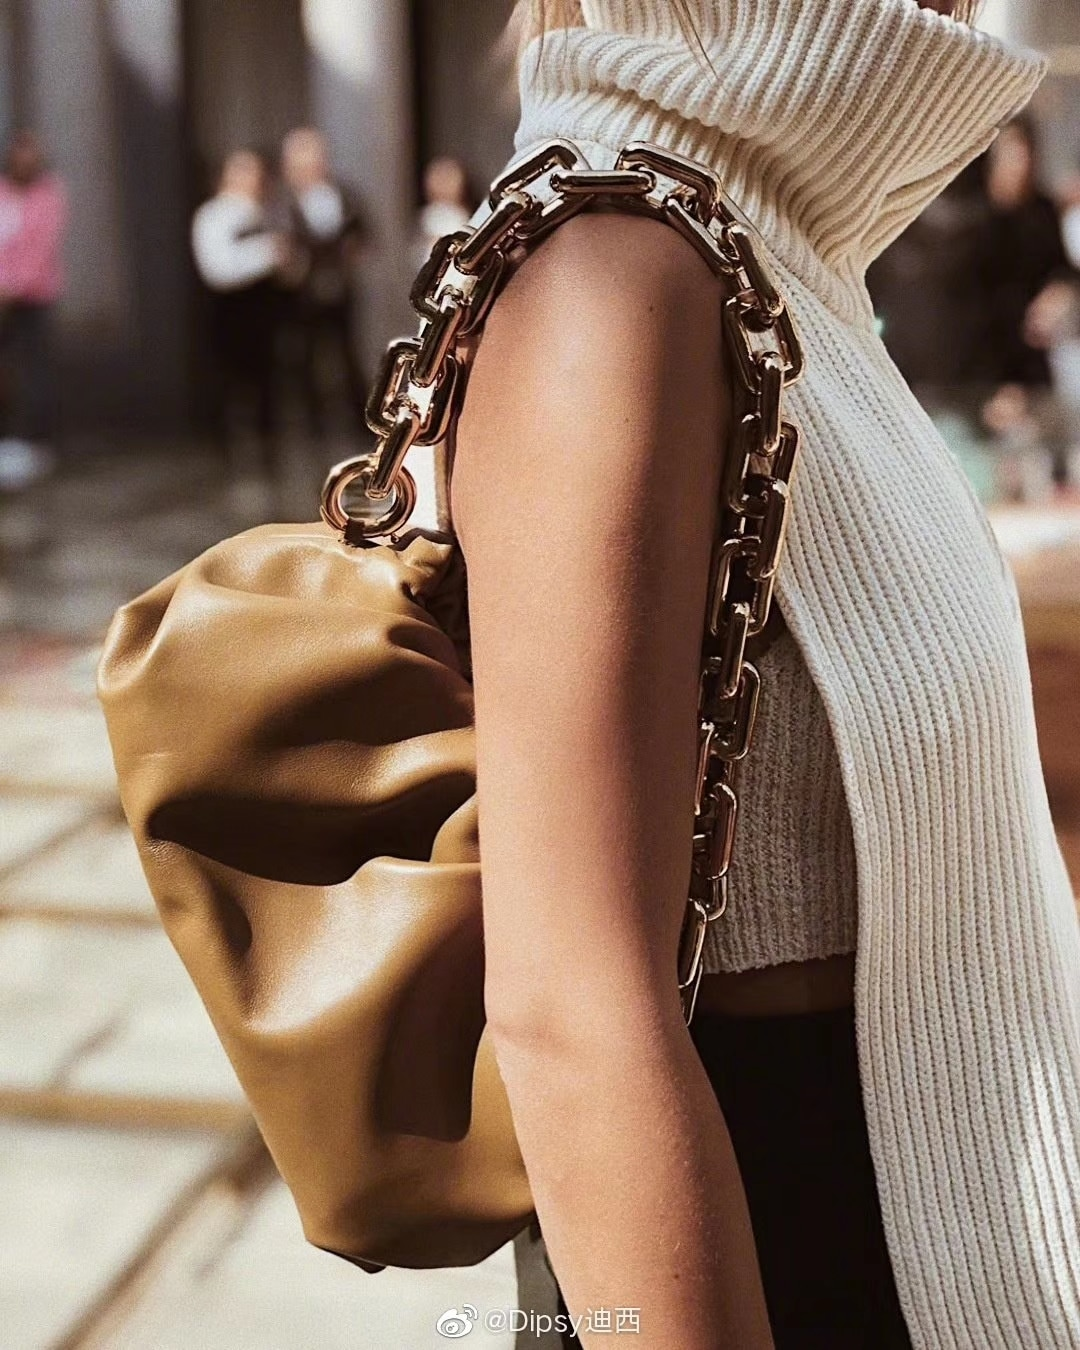 Clutch Bag Dumpling Bag Women'sLuxury Causal Stylish designer Women Crossbody Bag  Mini Shoulder Bag Canvas handbag heboing